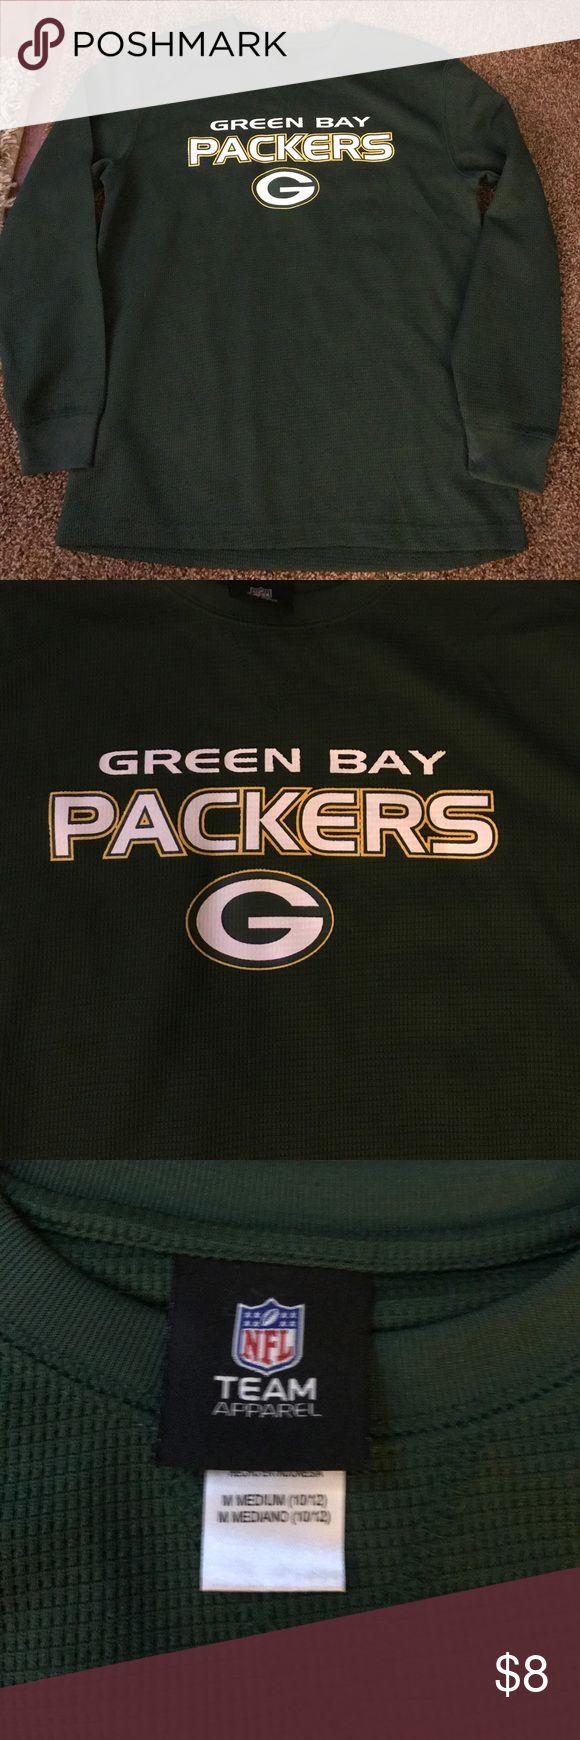 Green Bay Packers long sleeve Dark green. Green Bay packers NFL apparel long sleeve. Great condition. Size medium 10/12 NFL TEAM apparel Shirts & Tops Tees - Long Sleeve